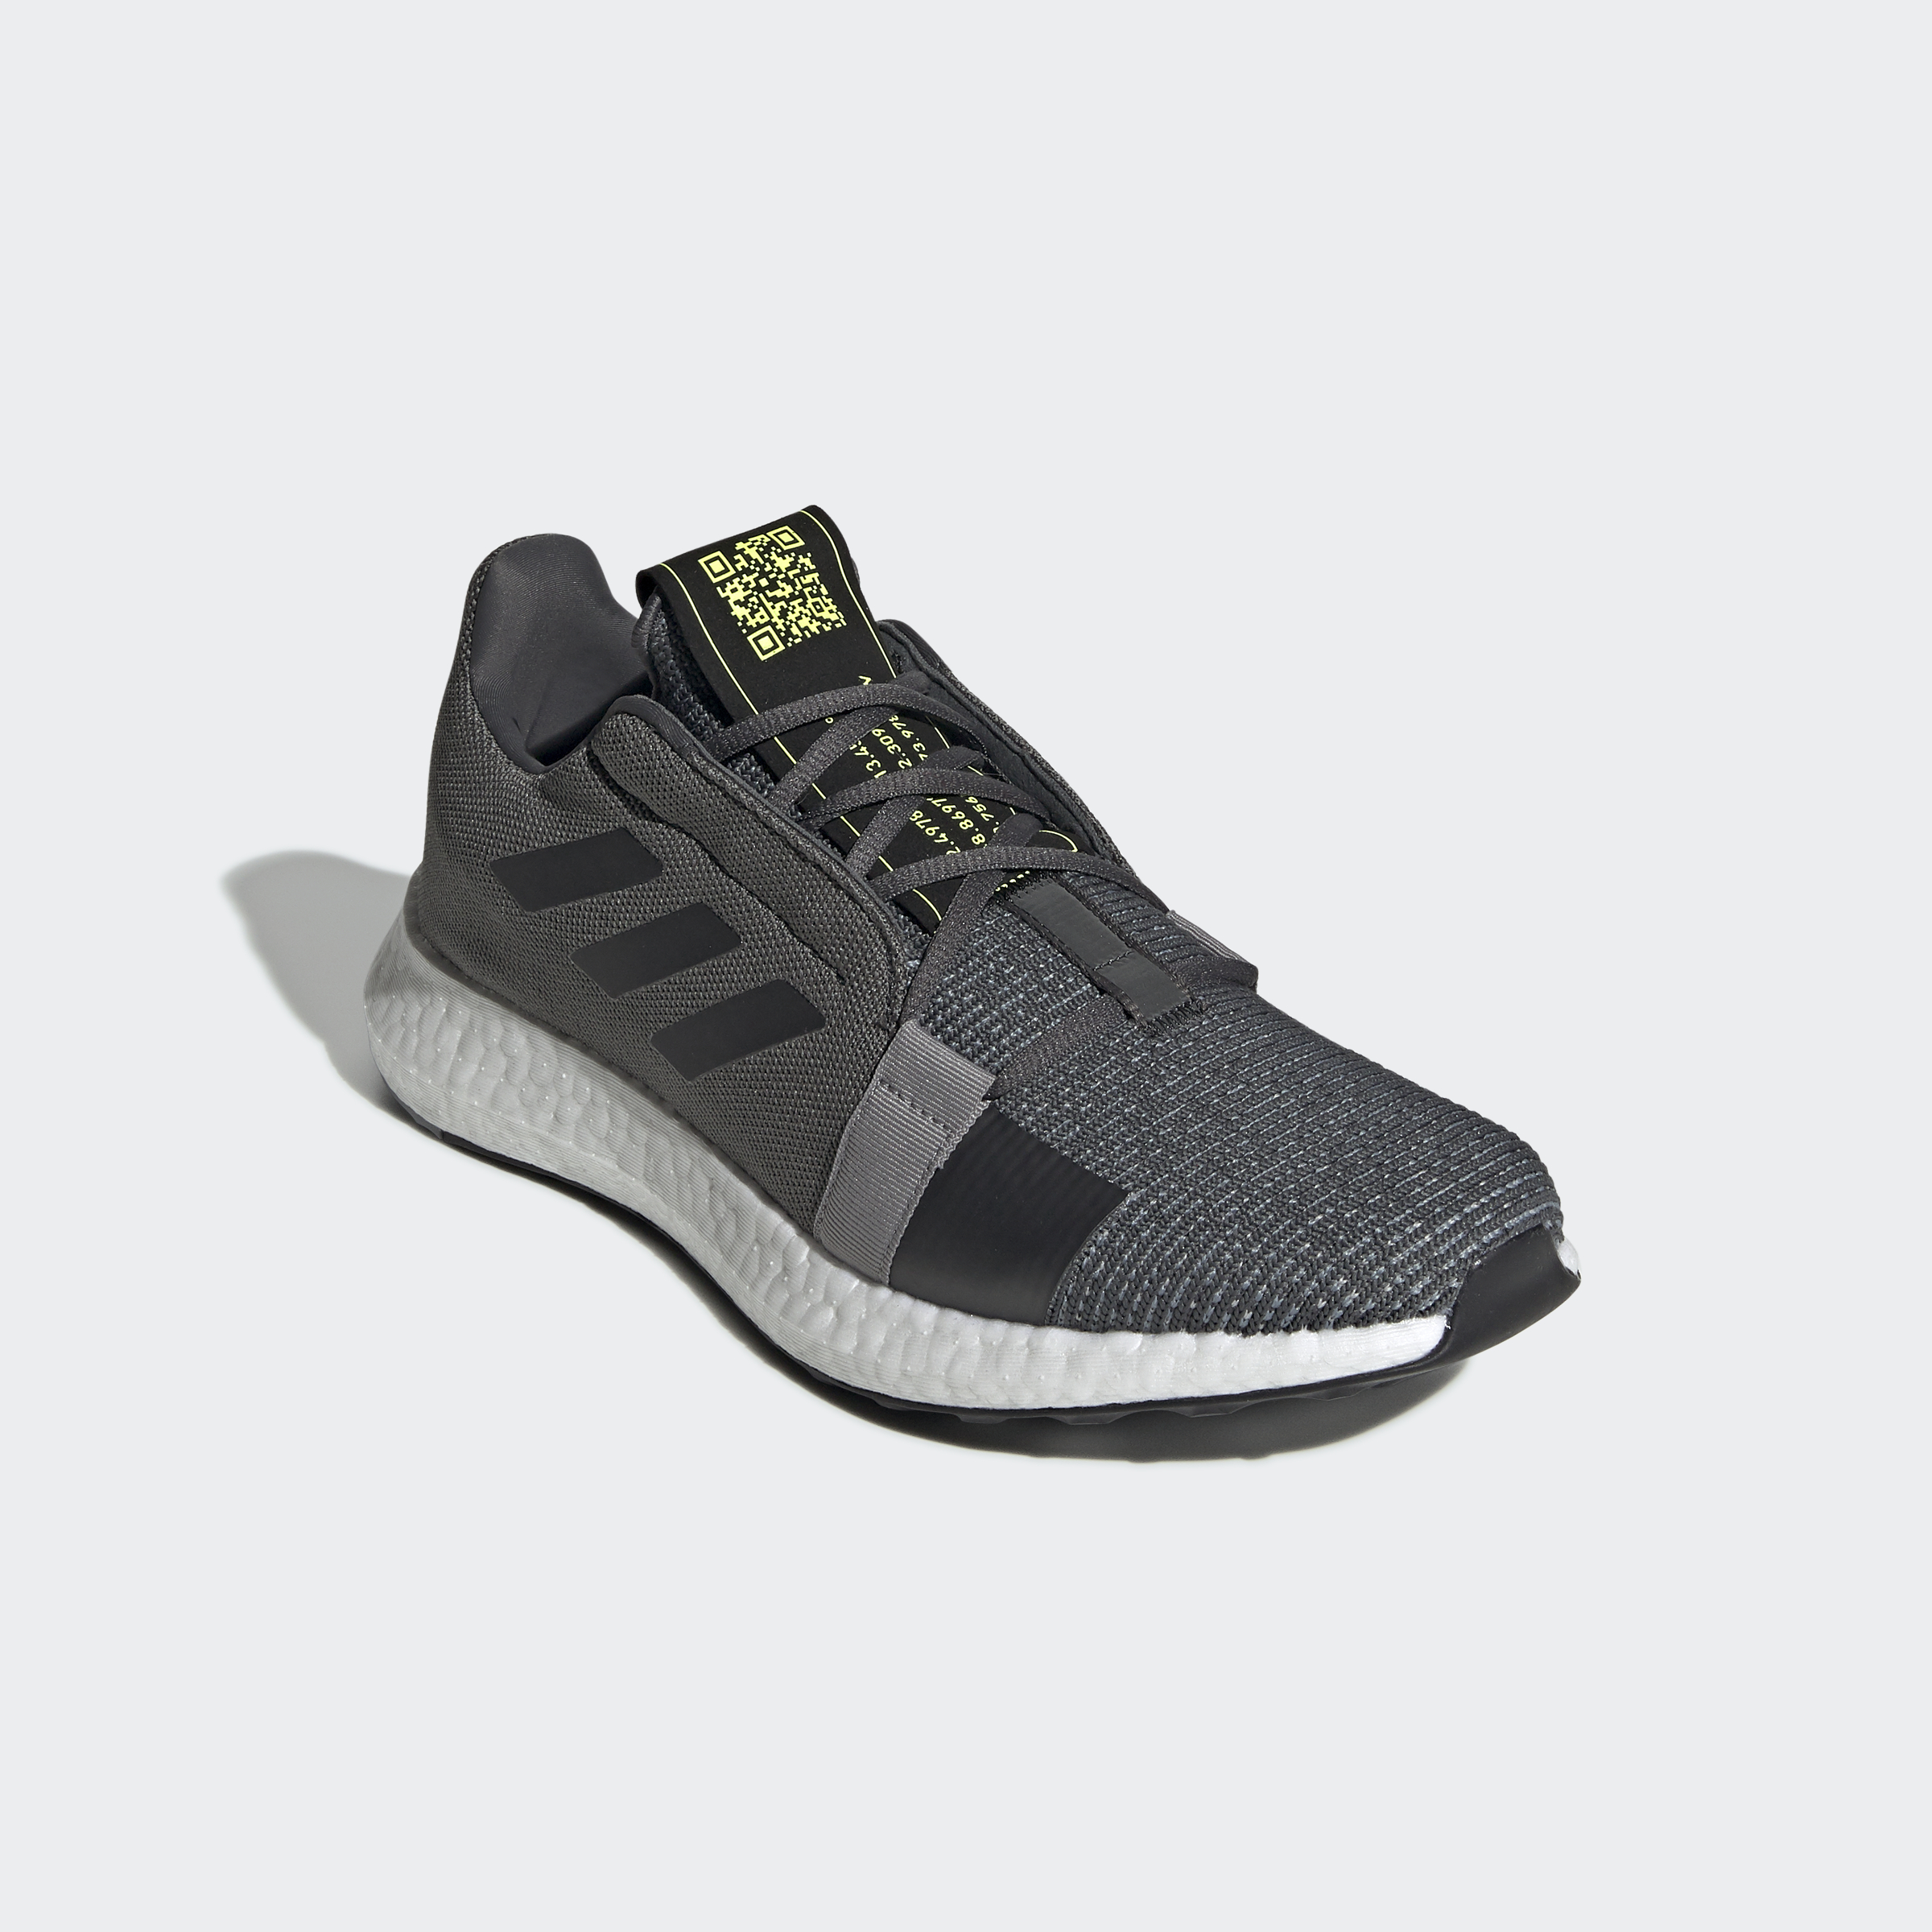 miniature 16 - adidas Senseboost Go Shoes Men's Athletic & Sneakers